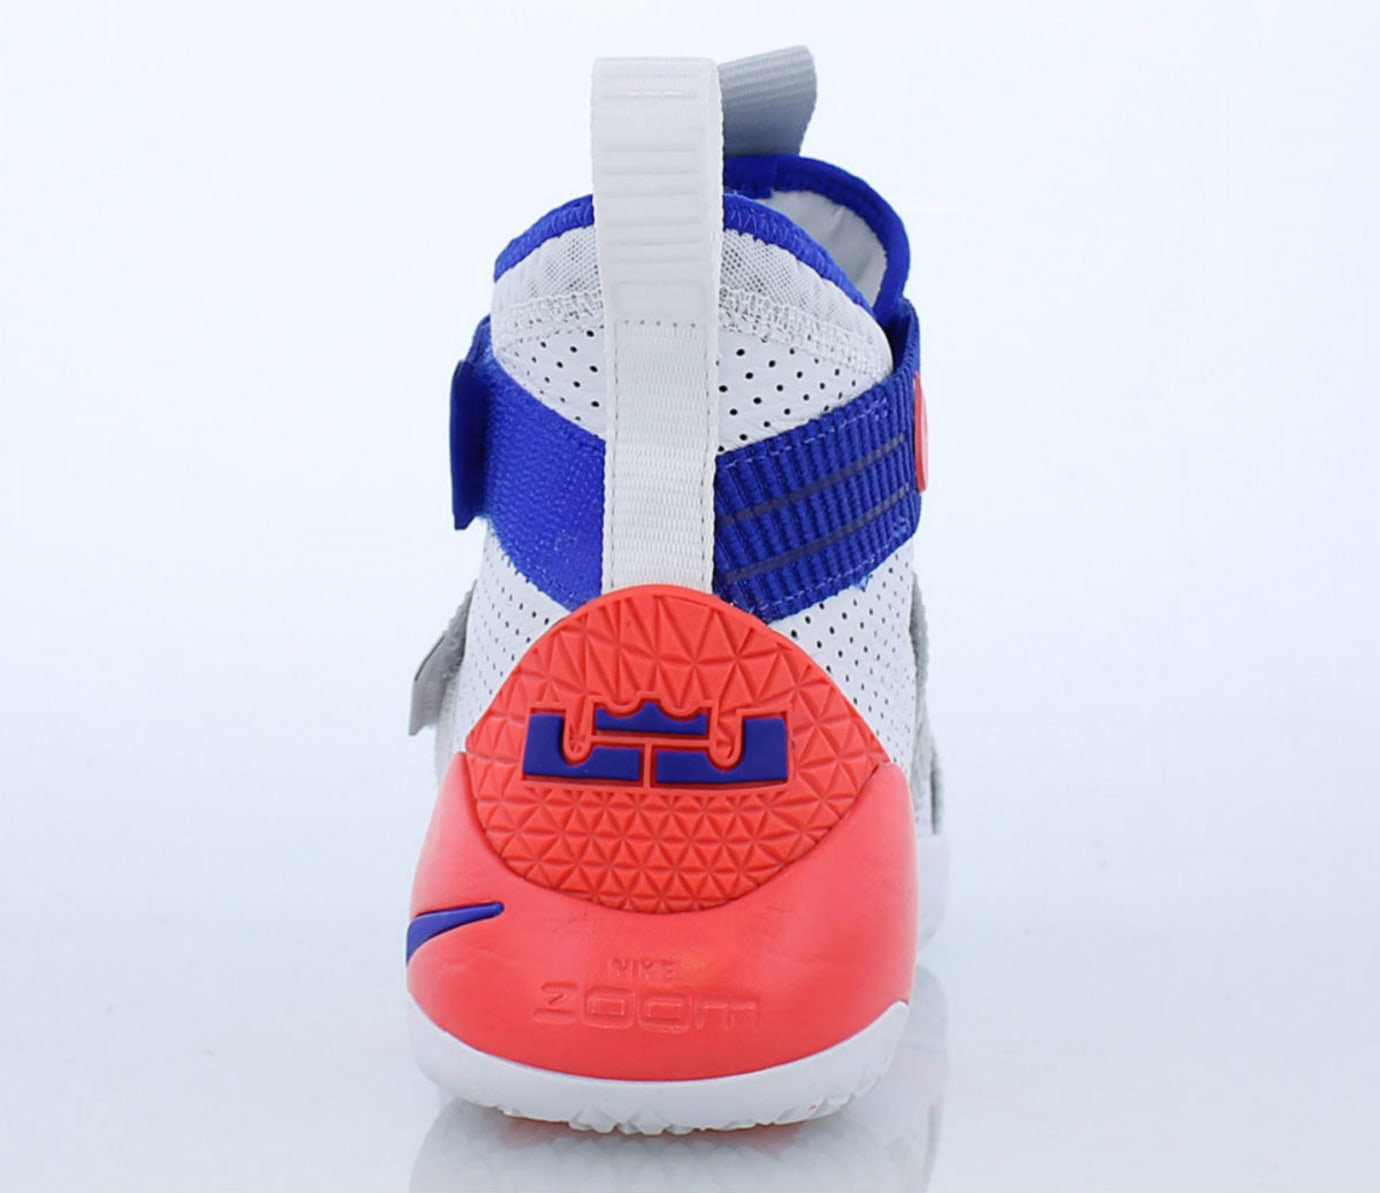 Nike LeBron Soldier 11 Ultramarine Release Date 897646-101 Heel